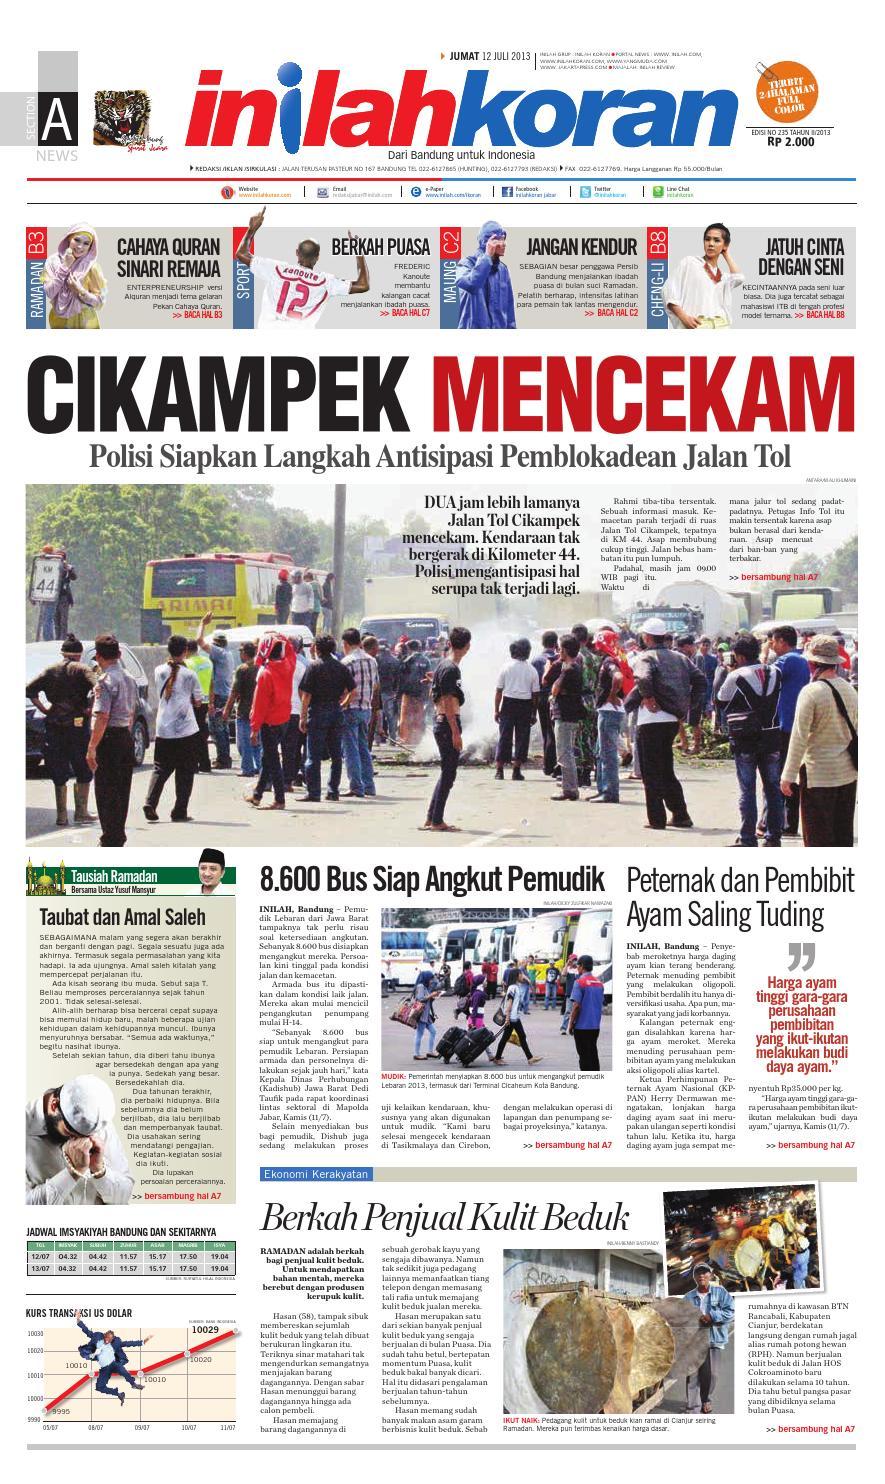 Cikampek Mencekam By Inilah Koran Issuu